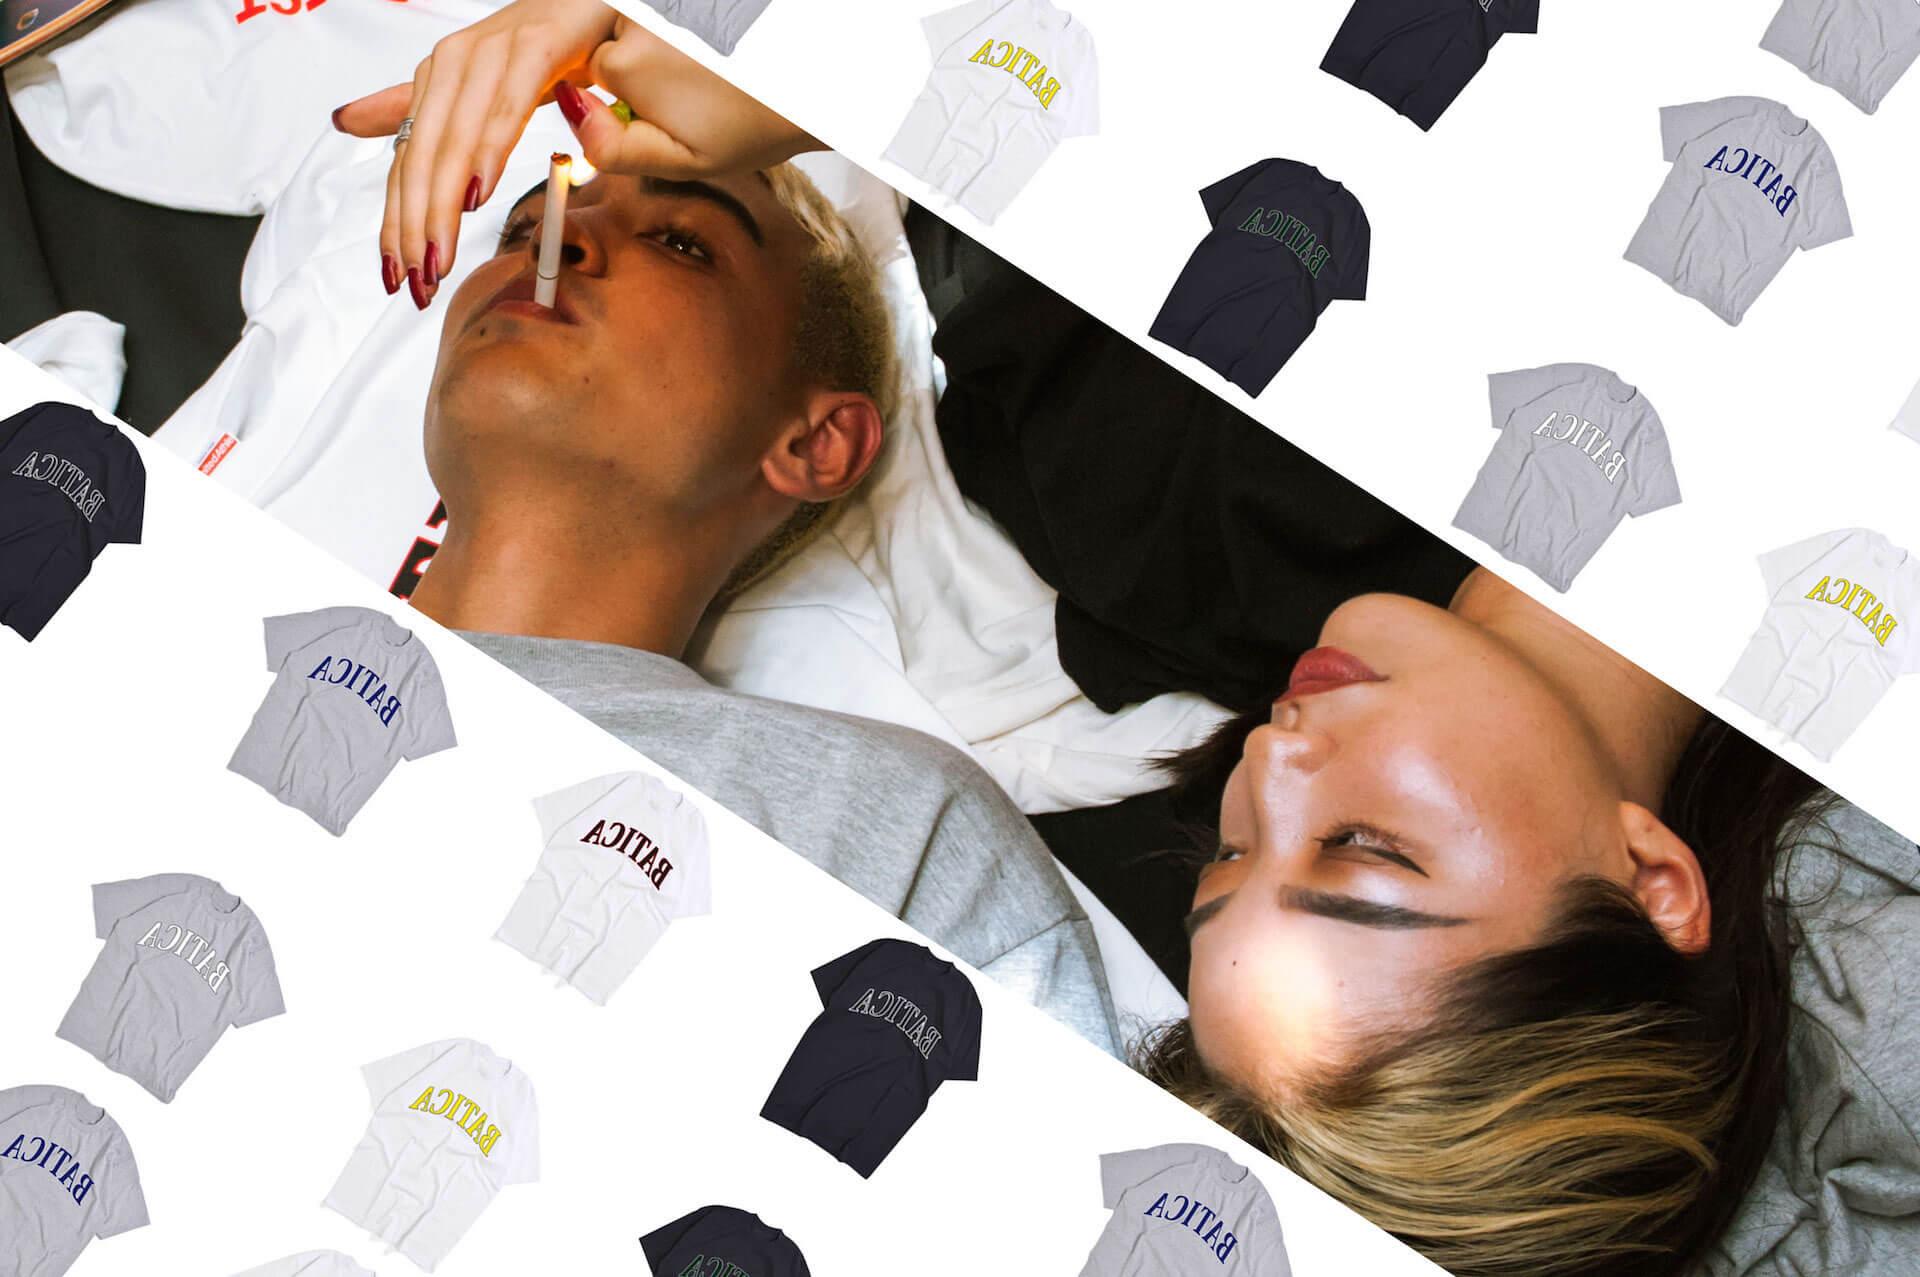 "EBISU BATICAの新アパレルプロジェクト""CARTEL WEAR""が始動|本日よりTシャツ6色が販売開始 life200920_batica_tshirt_6"